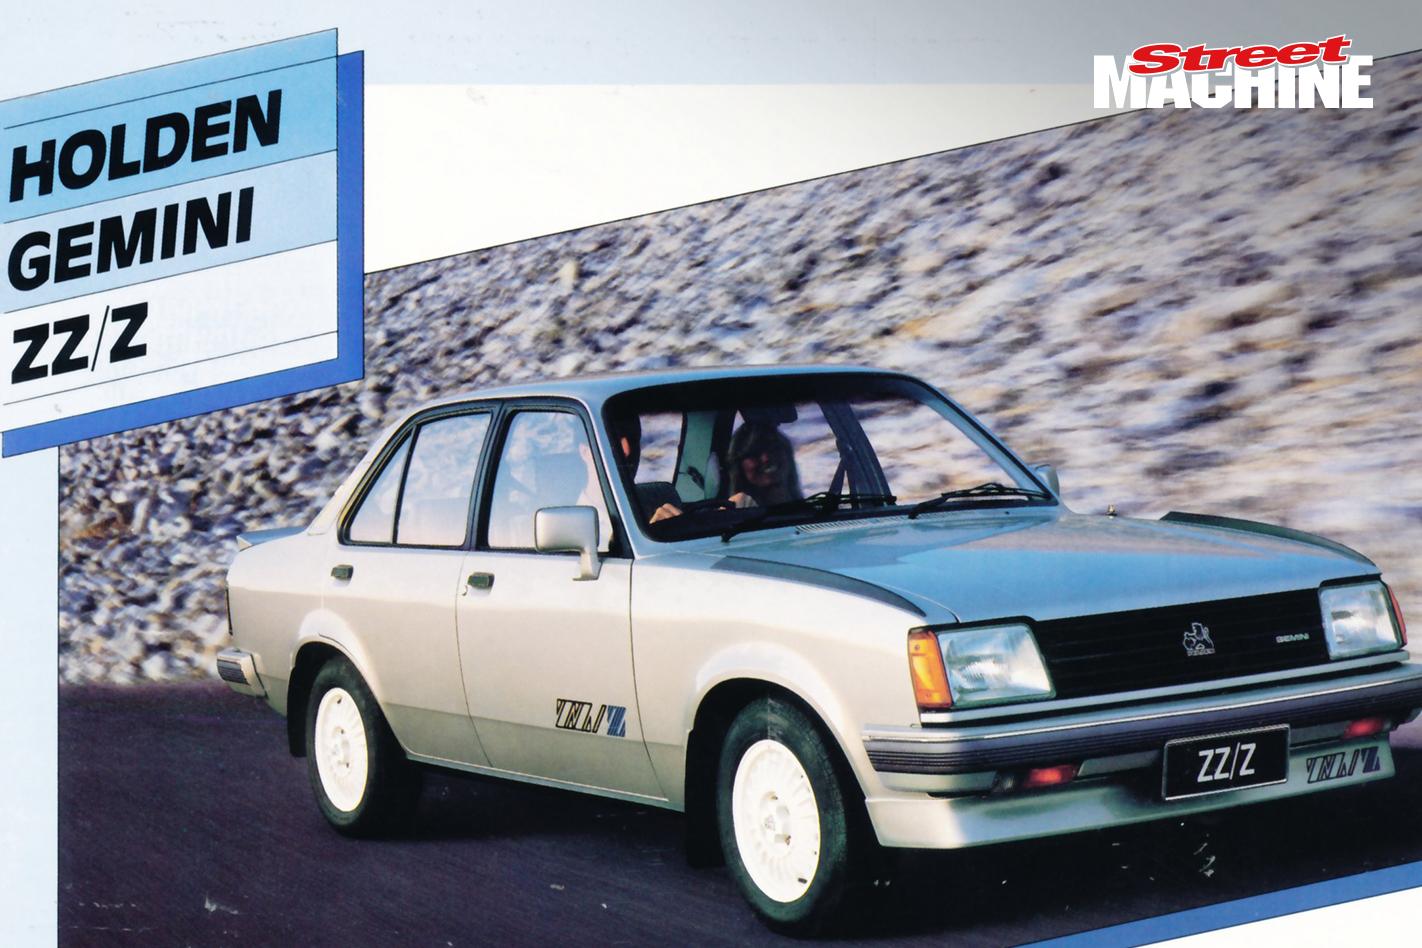 Holden Gemini ZZZ Nw